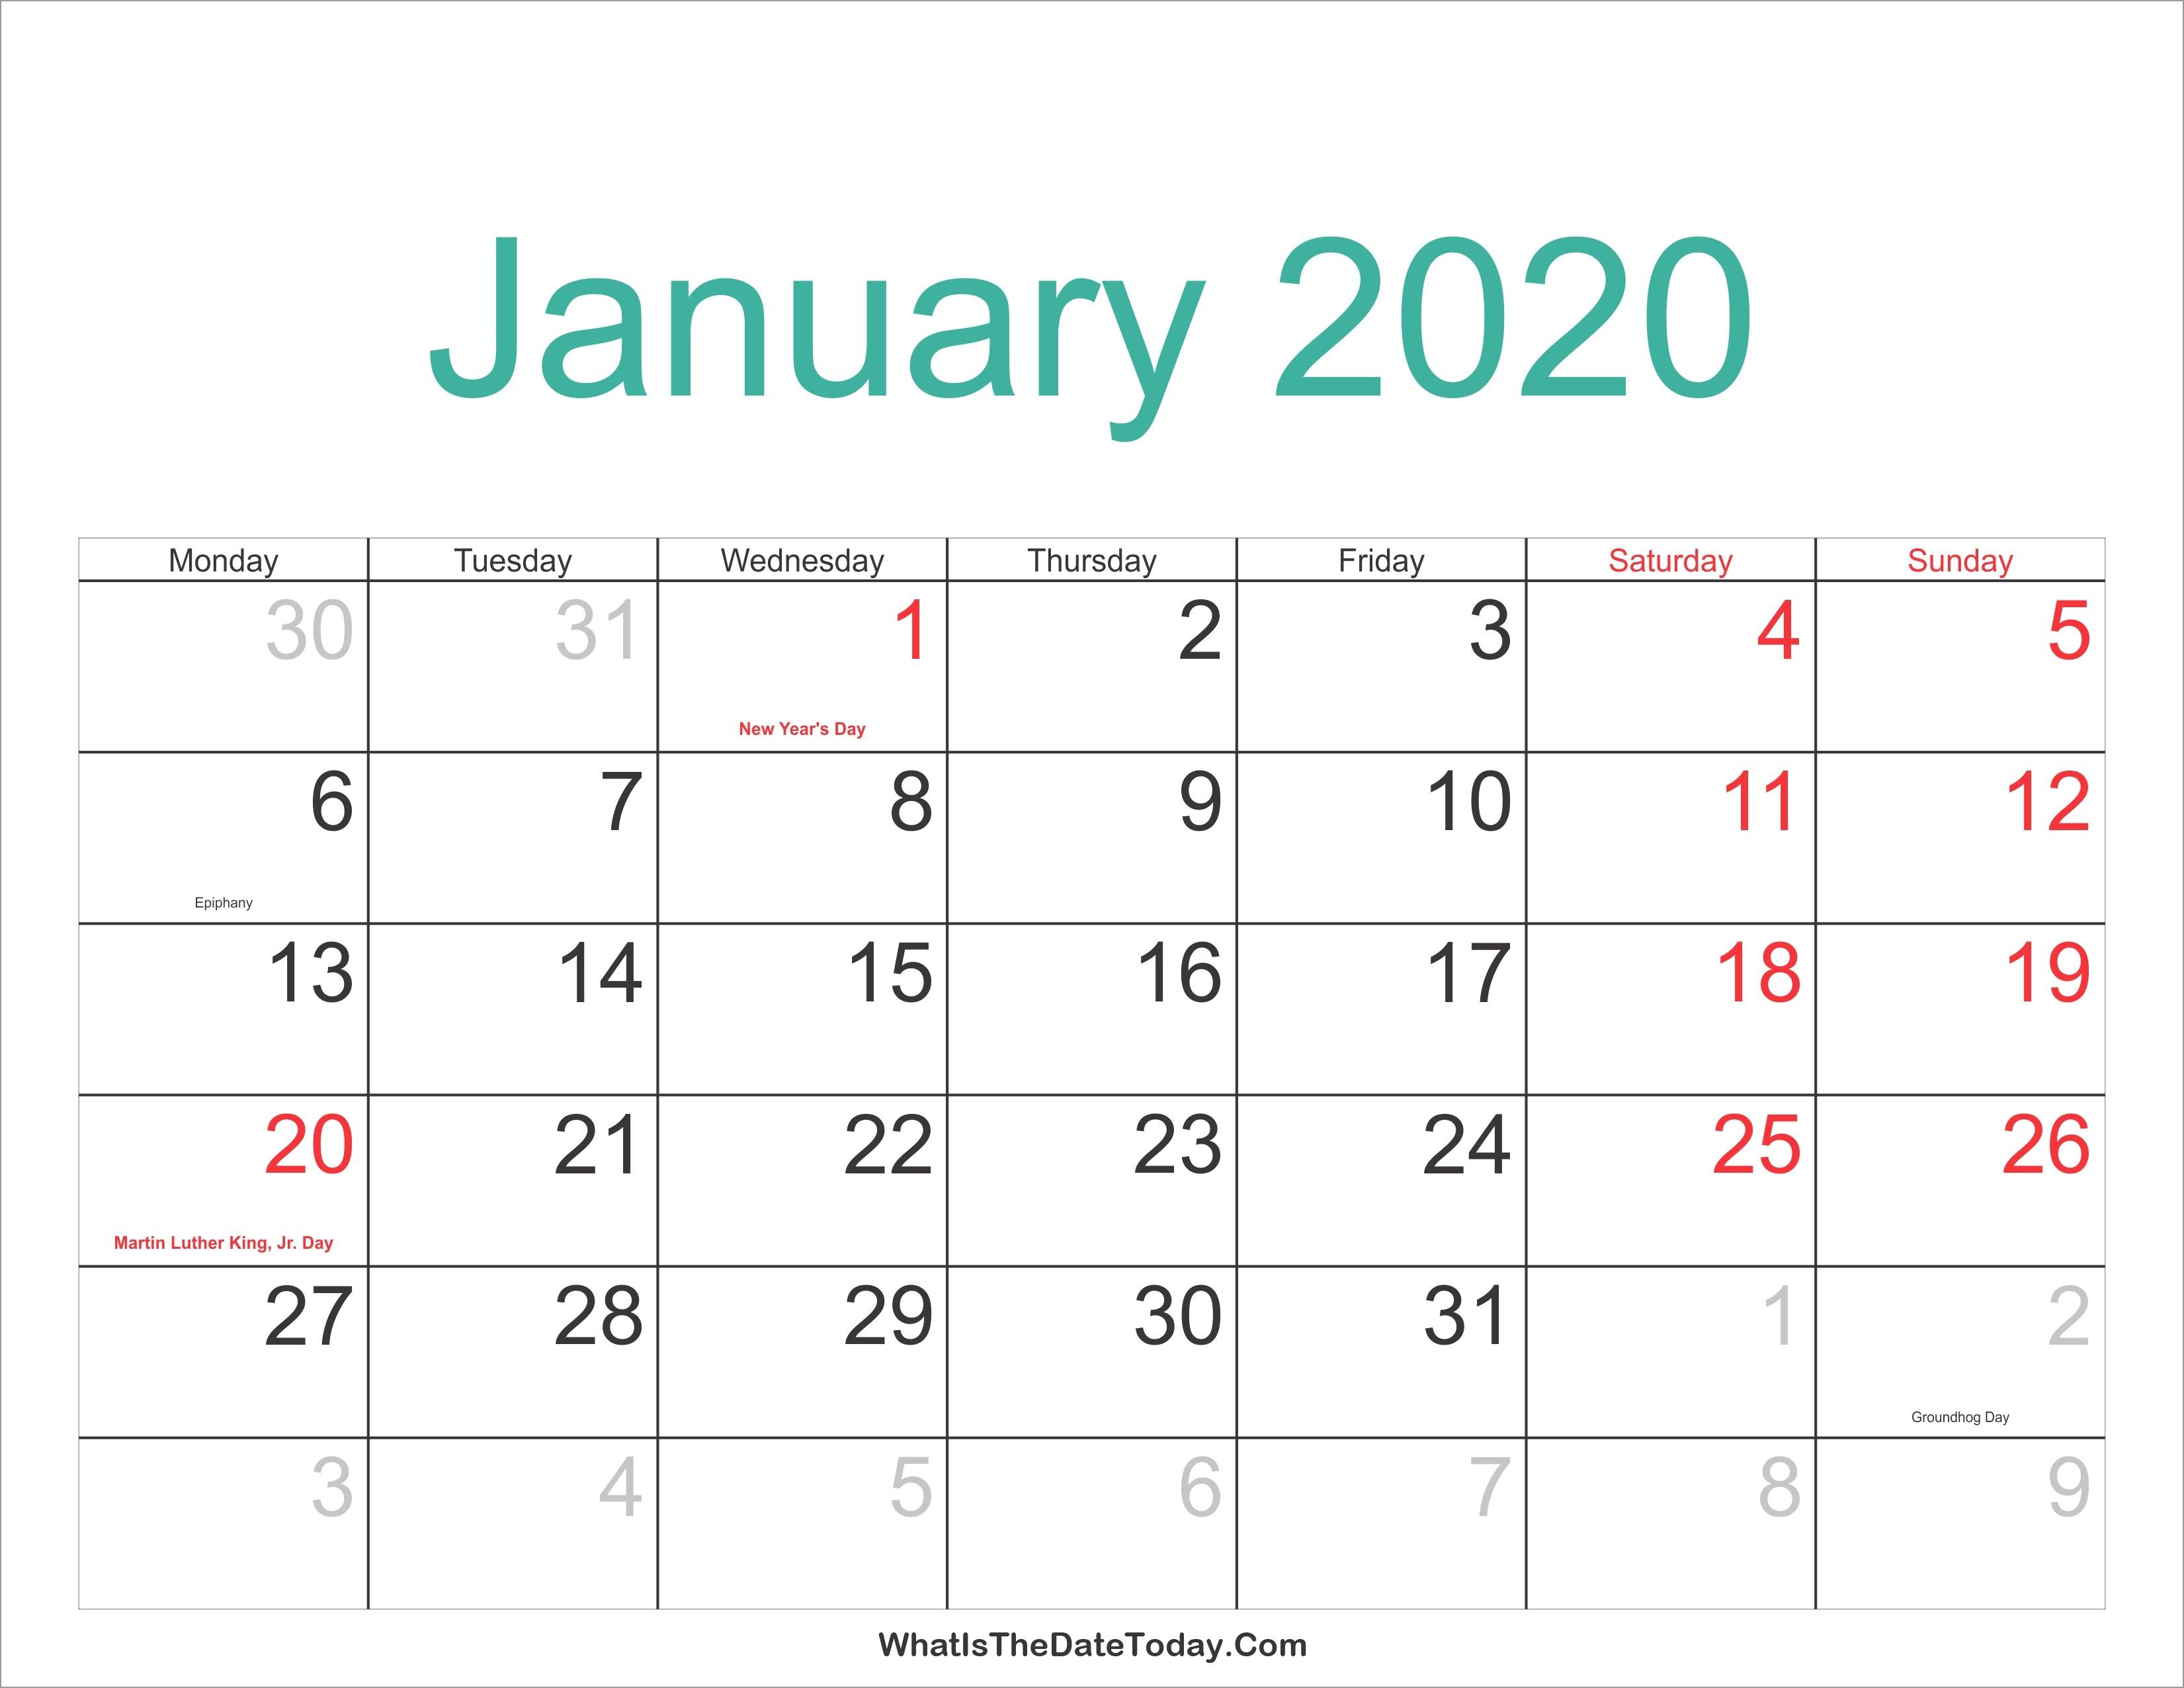 January 2020 Calendar Printable Holidays Full | Jcreview-January 2020 Calendar Holidays